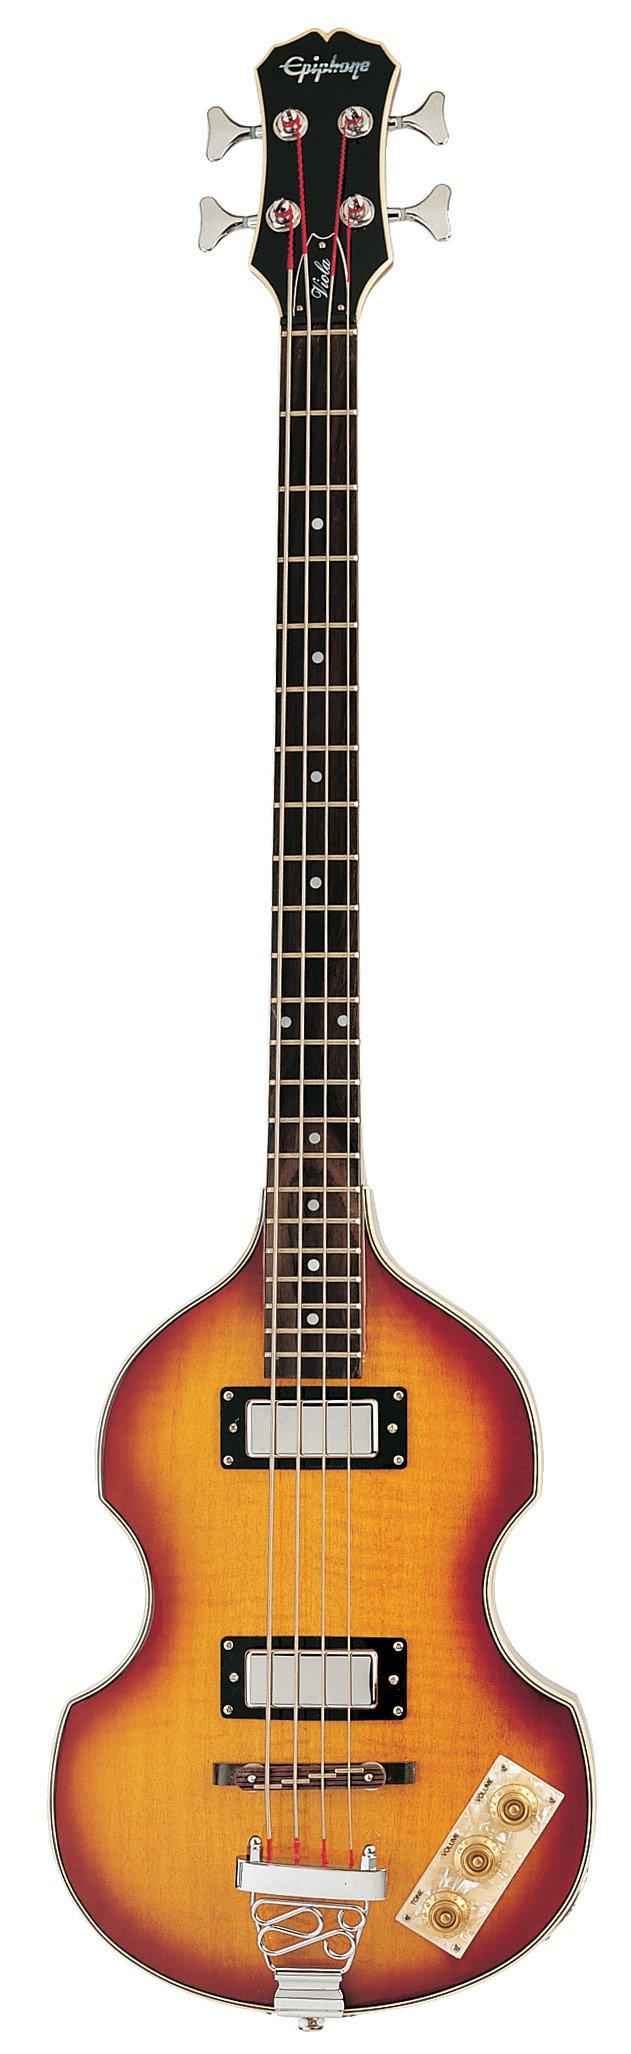 Epiphone VIOLA Electric Bass Guitar, Vintage Sunburst